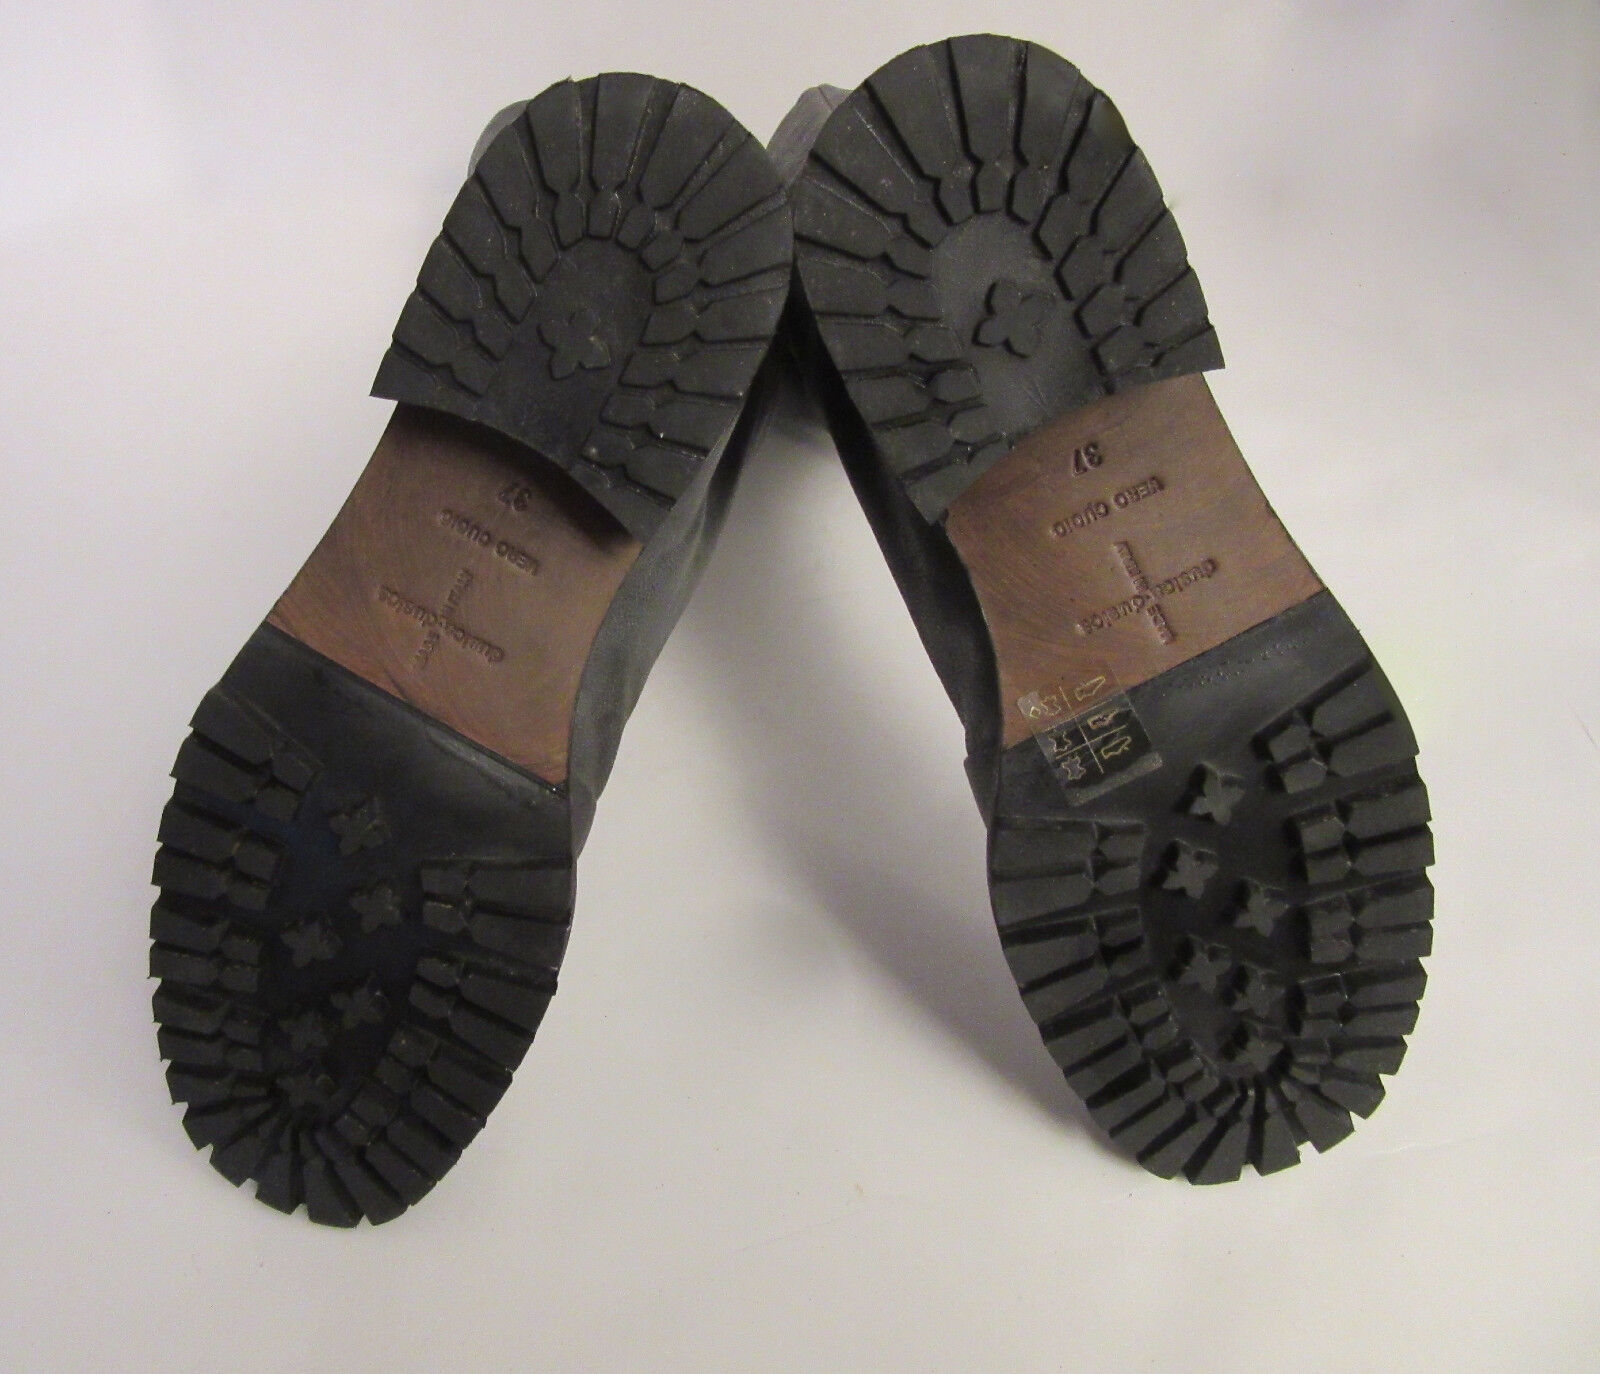 32ed524c56a ... Dusica Dusica damen grau Leather Distressed Stiefel Stiefel Stiefel Zip  Front Größe 7M 339643 ...